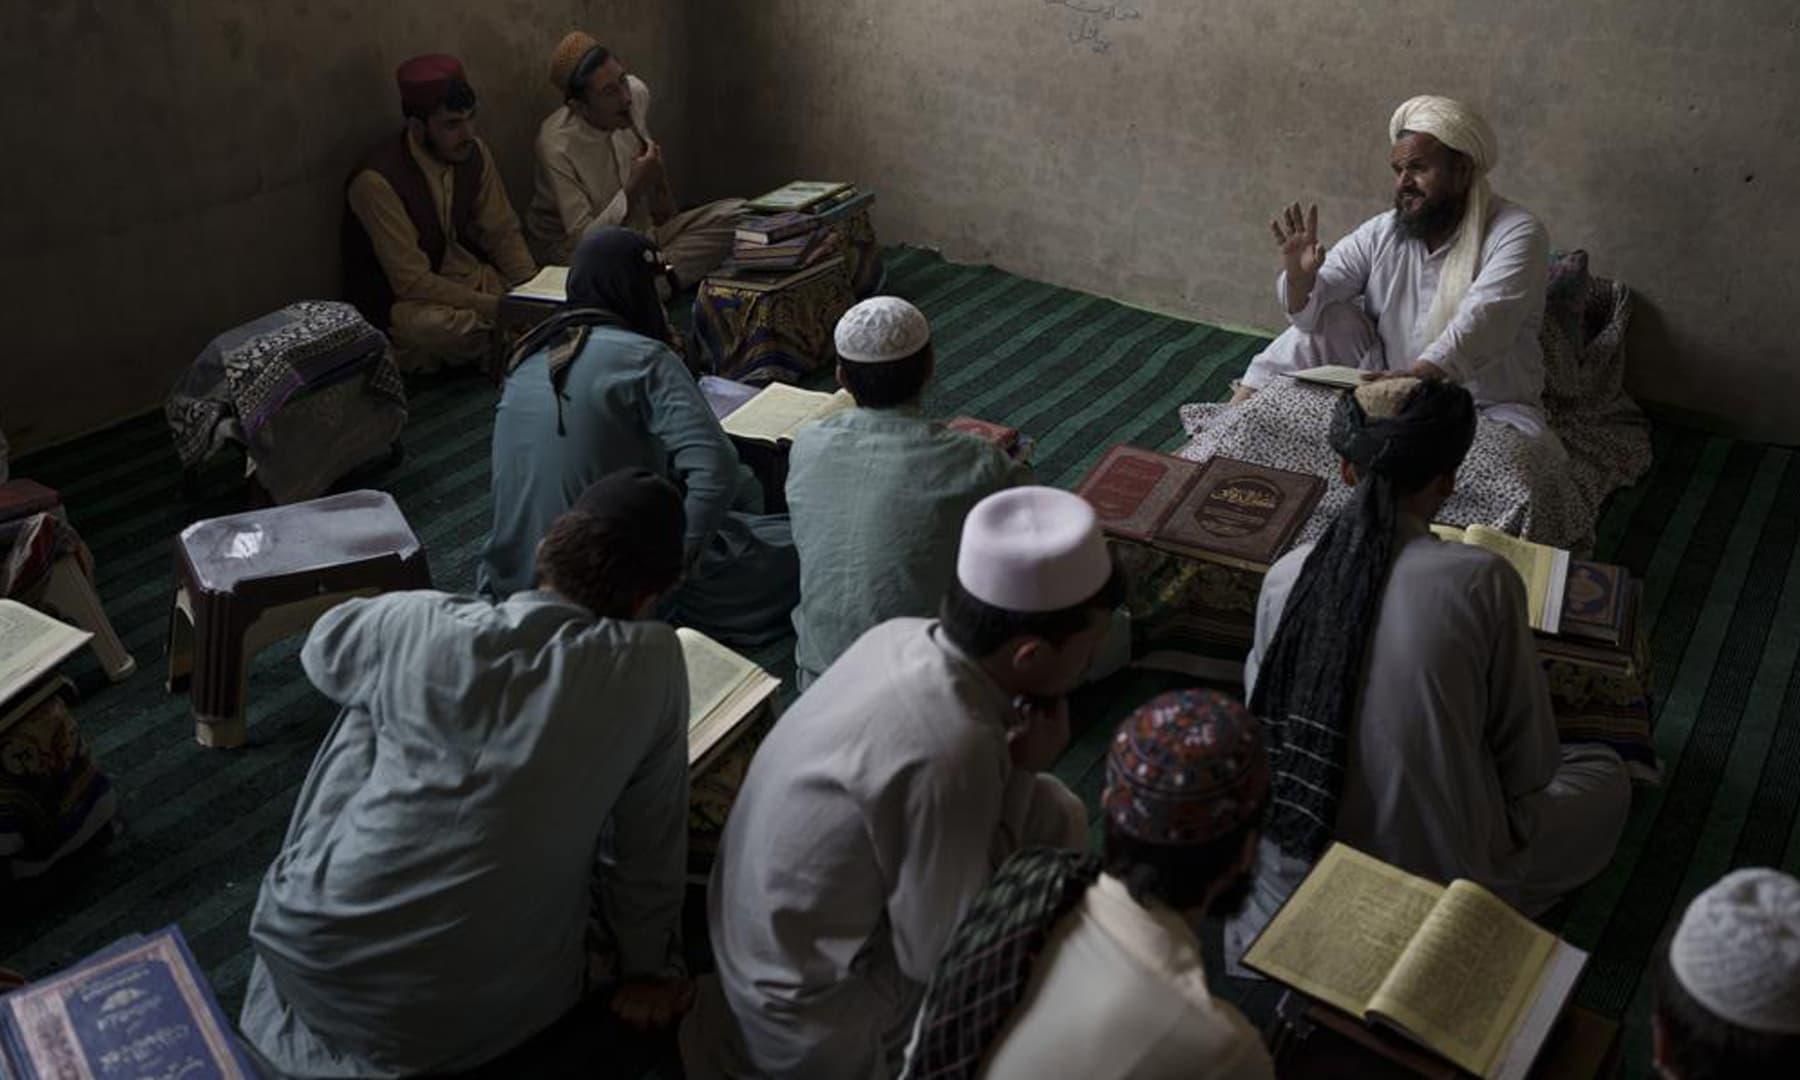 A teacher talks to students during class at the Khatamul Anbiya madressah in Kabul, Afghanistan. — AP